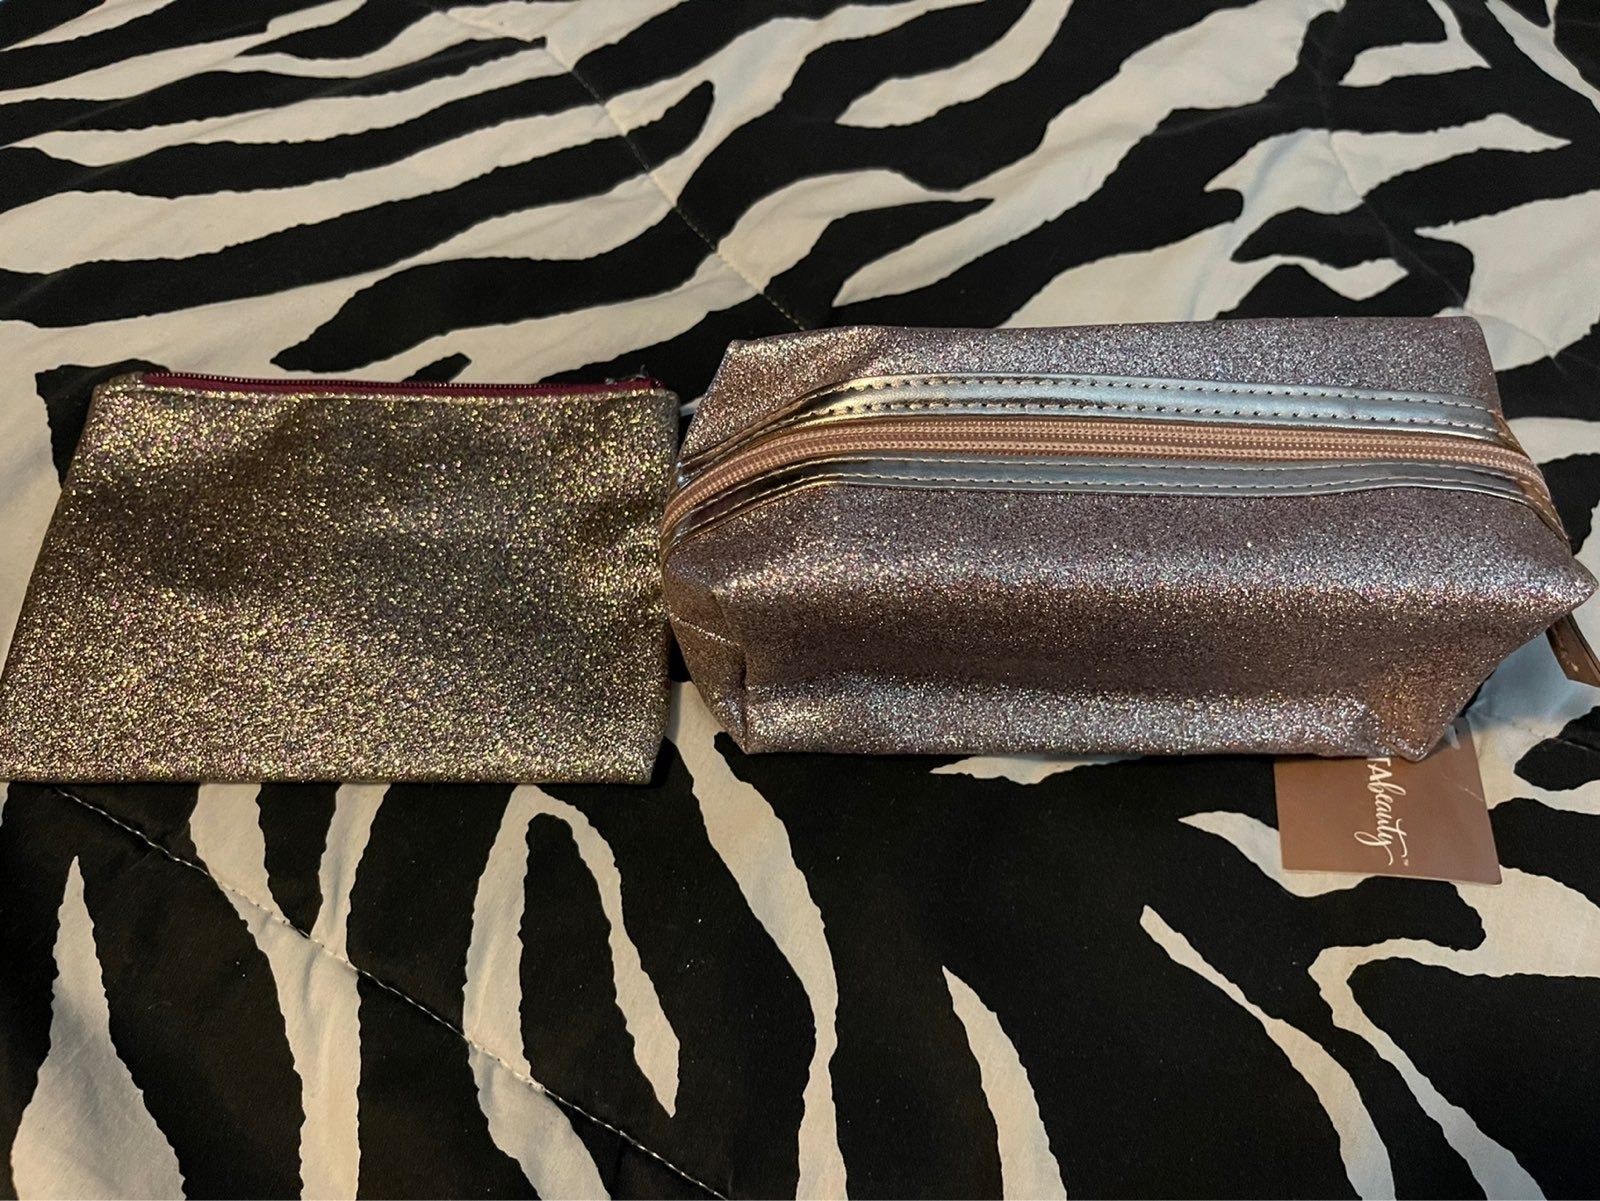 Ulta & B&BW glitter makeup bags